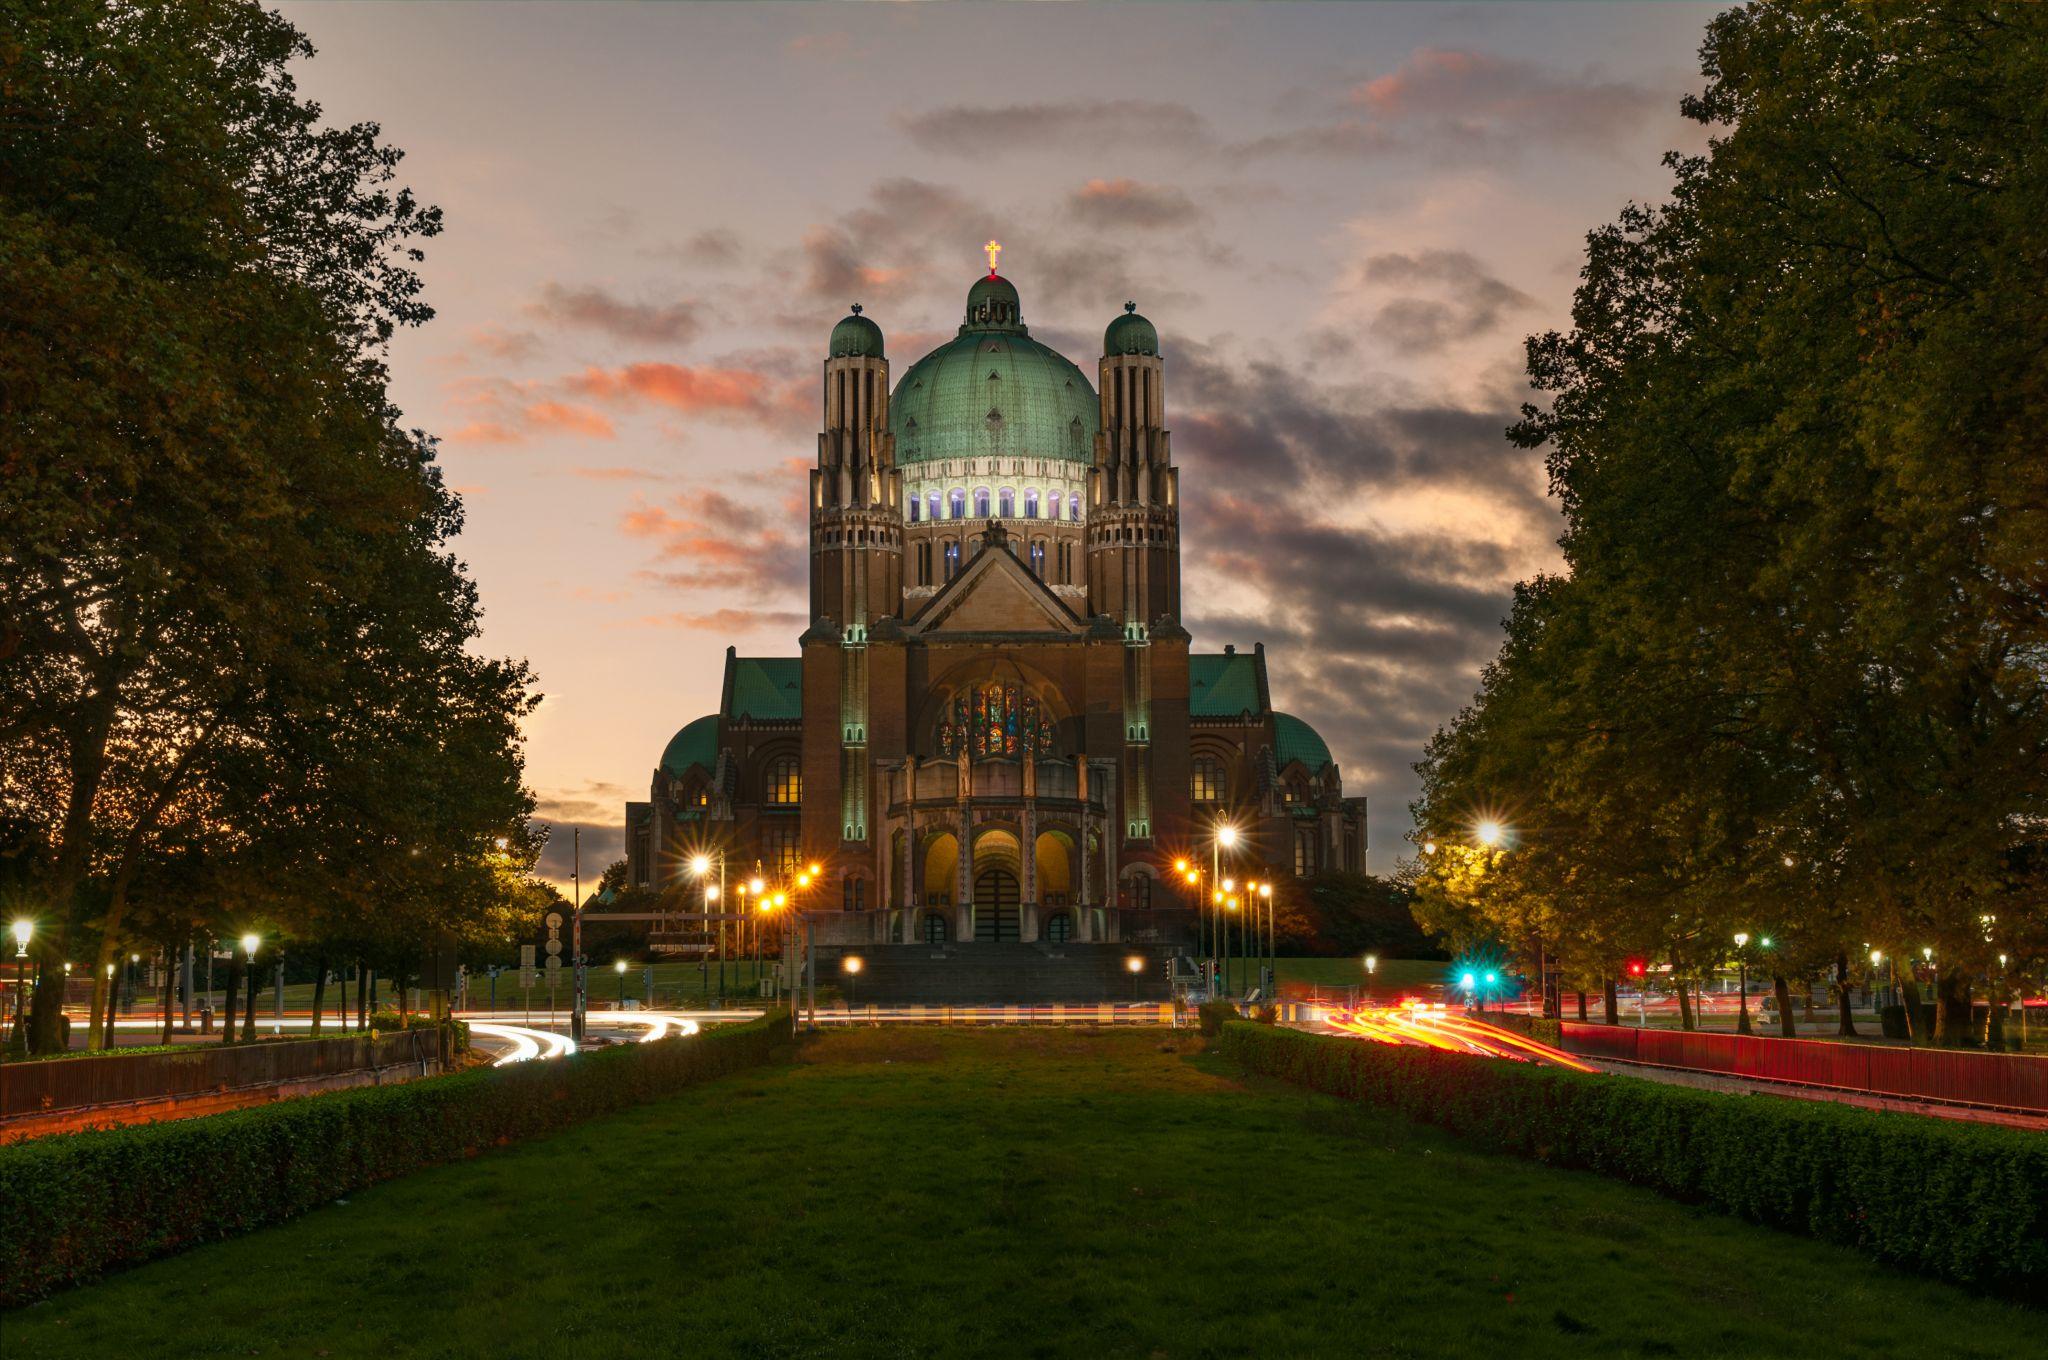 Basilica of the Sacred Heart in Koekelberg, Belgium